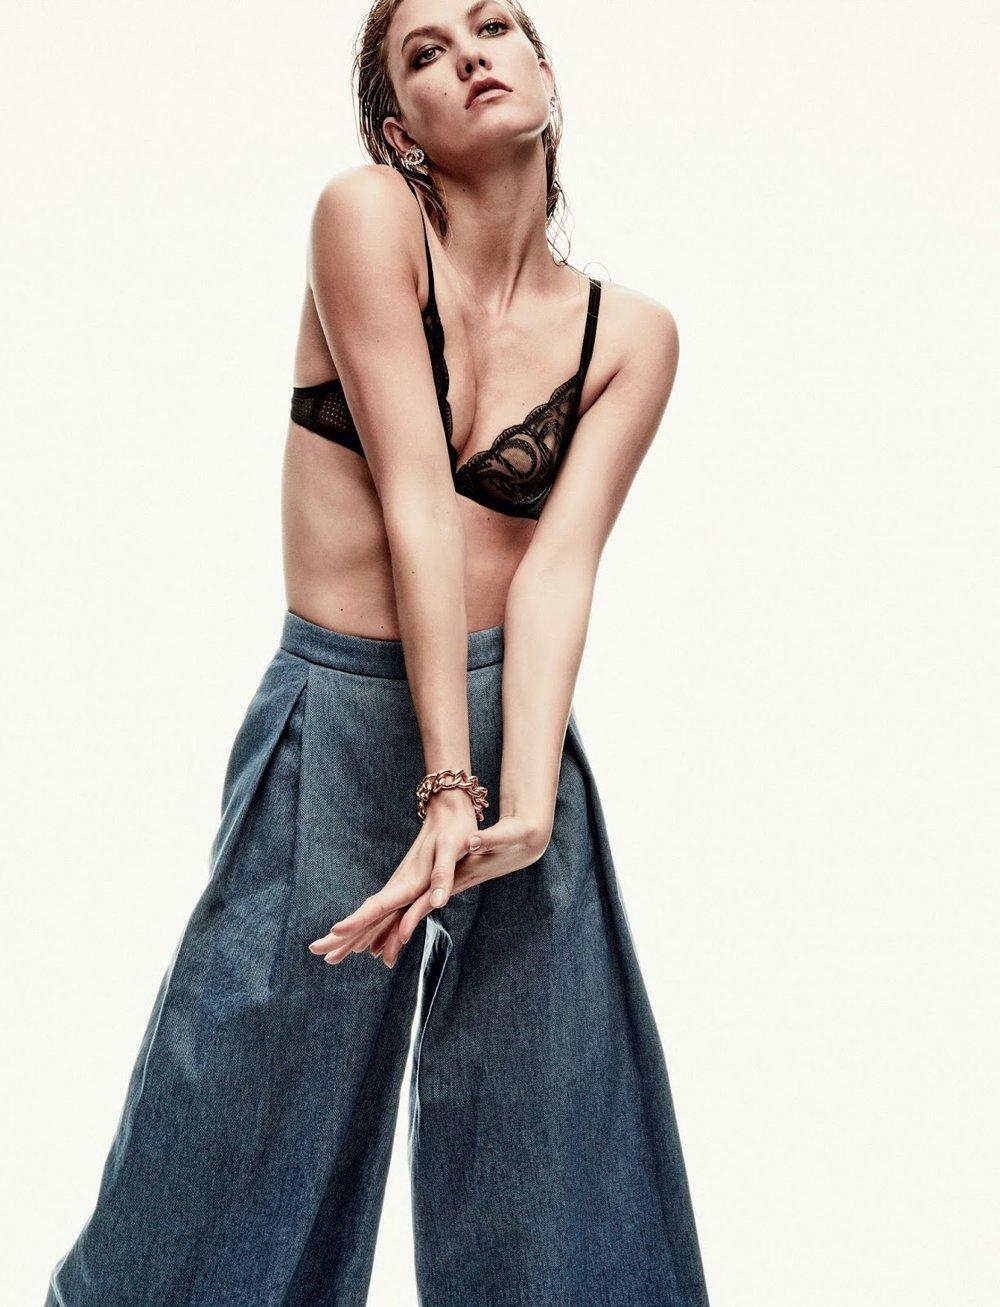 Vogue Mexico October 2016 - karlie-kloss-chris-colls- (7).jpg